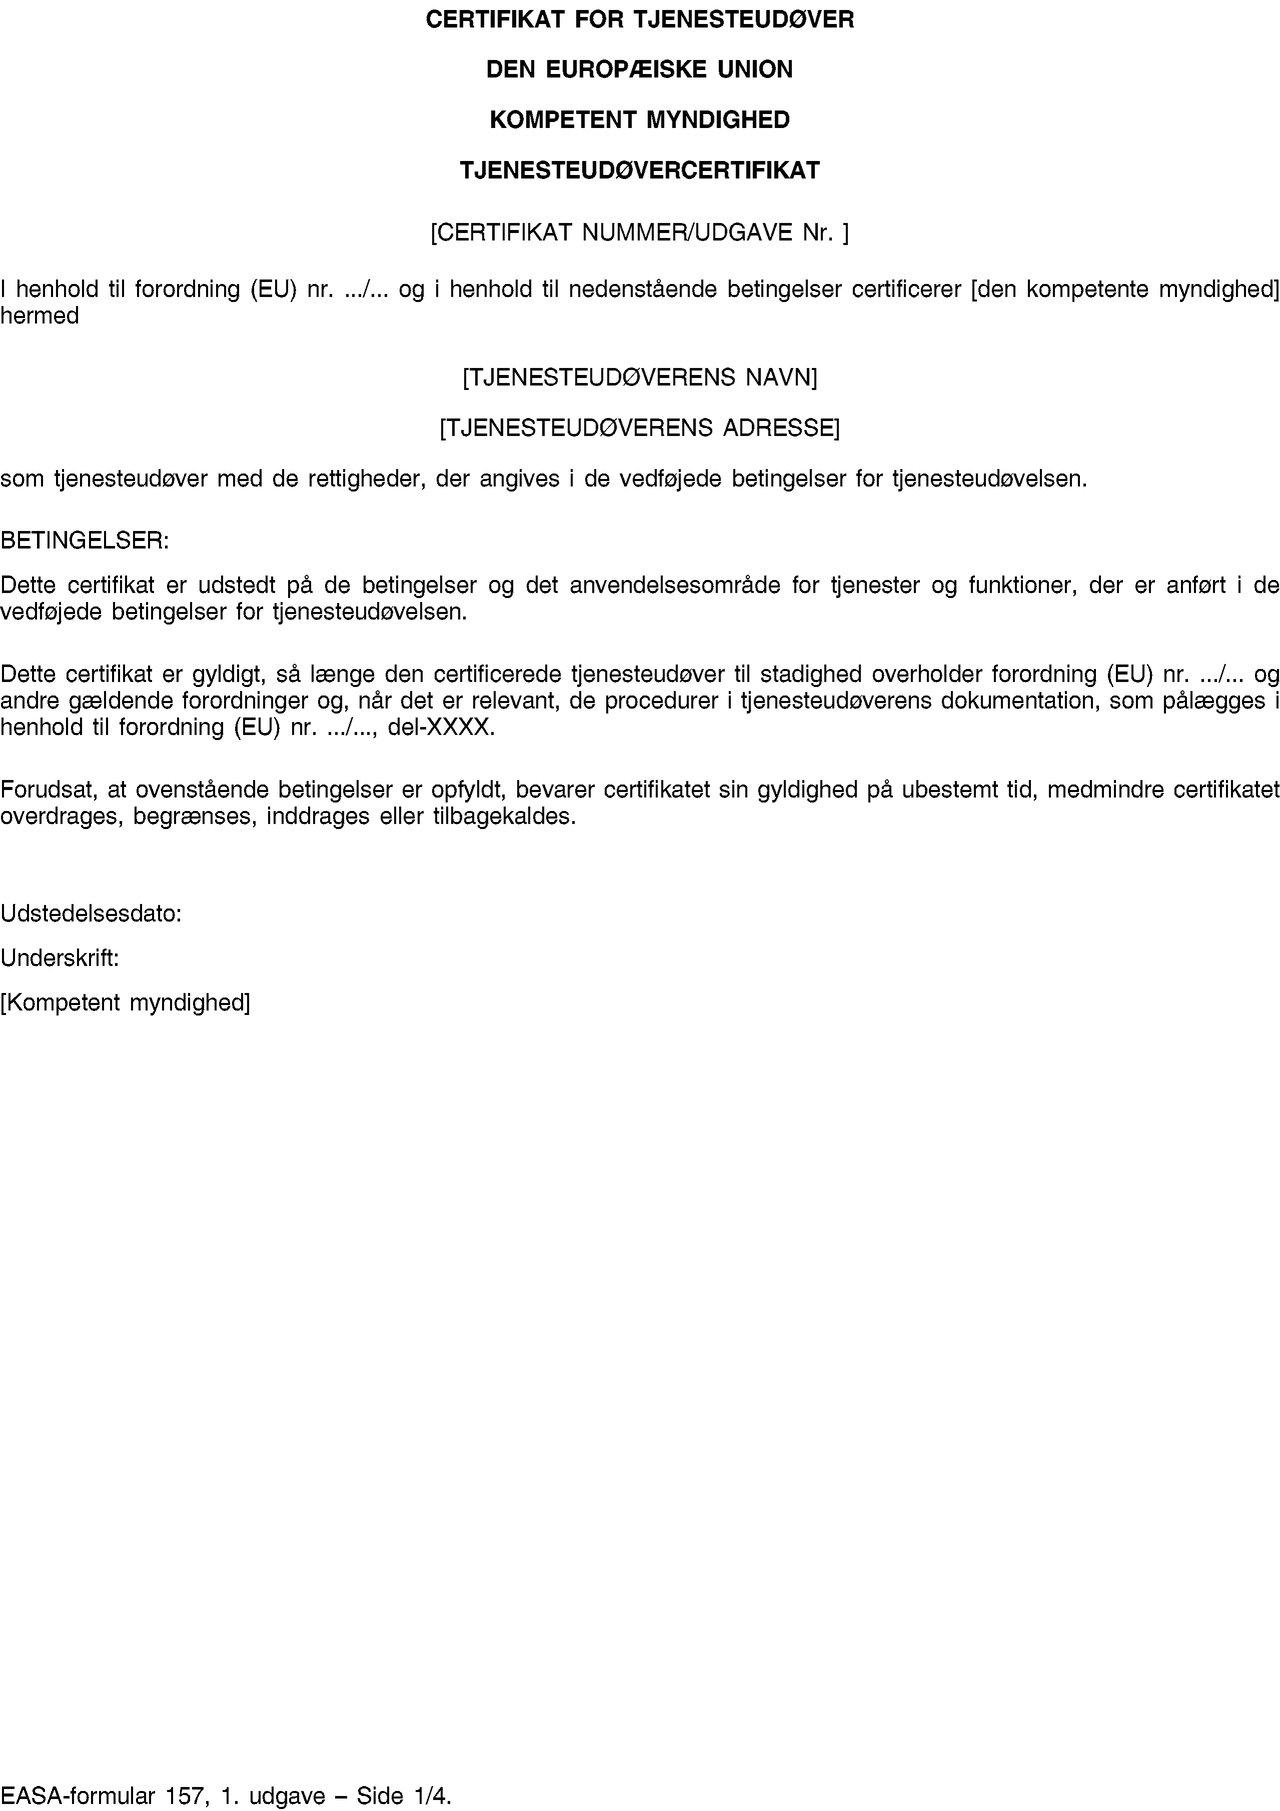 EUR-Lex - 32016R1377 - EN - EUR-Lex